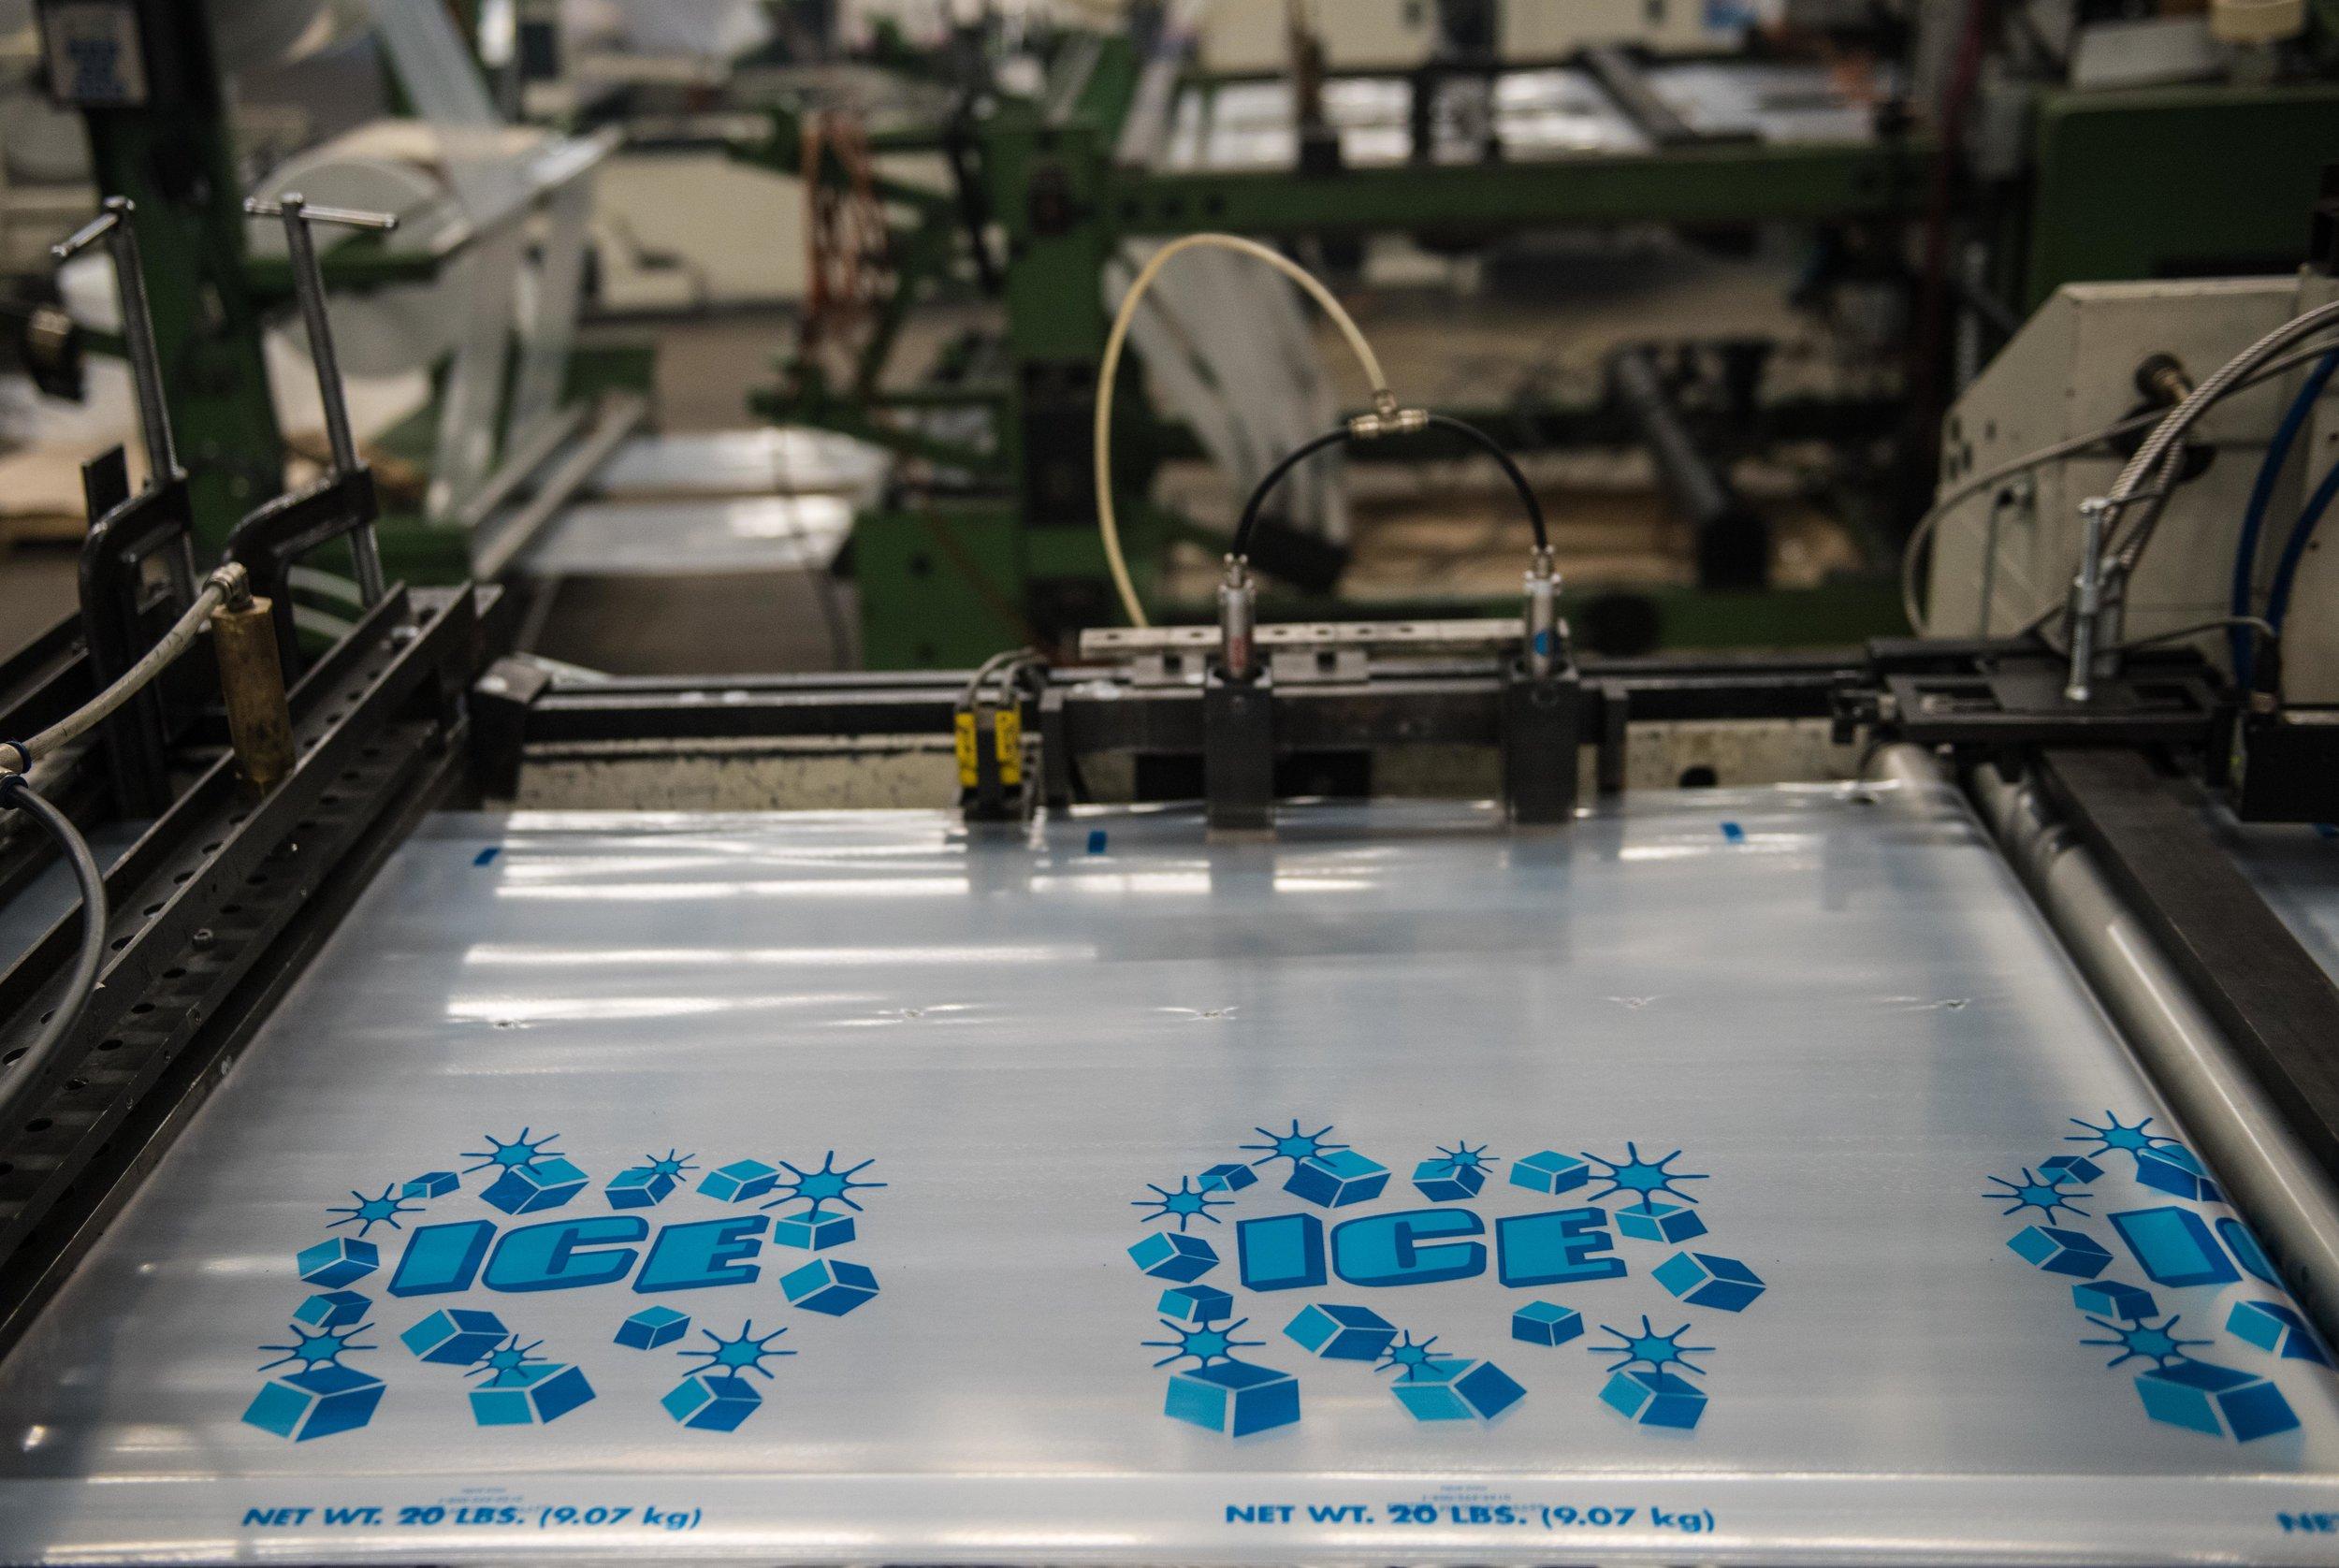 high quality polyethylene bags production line photography